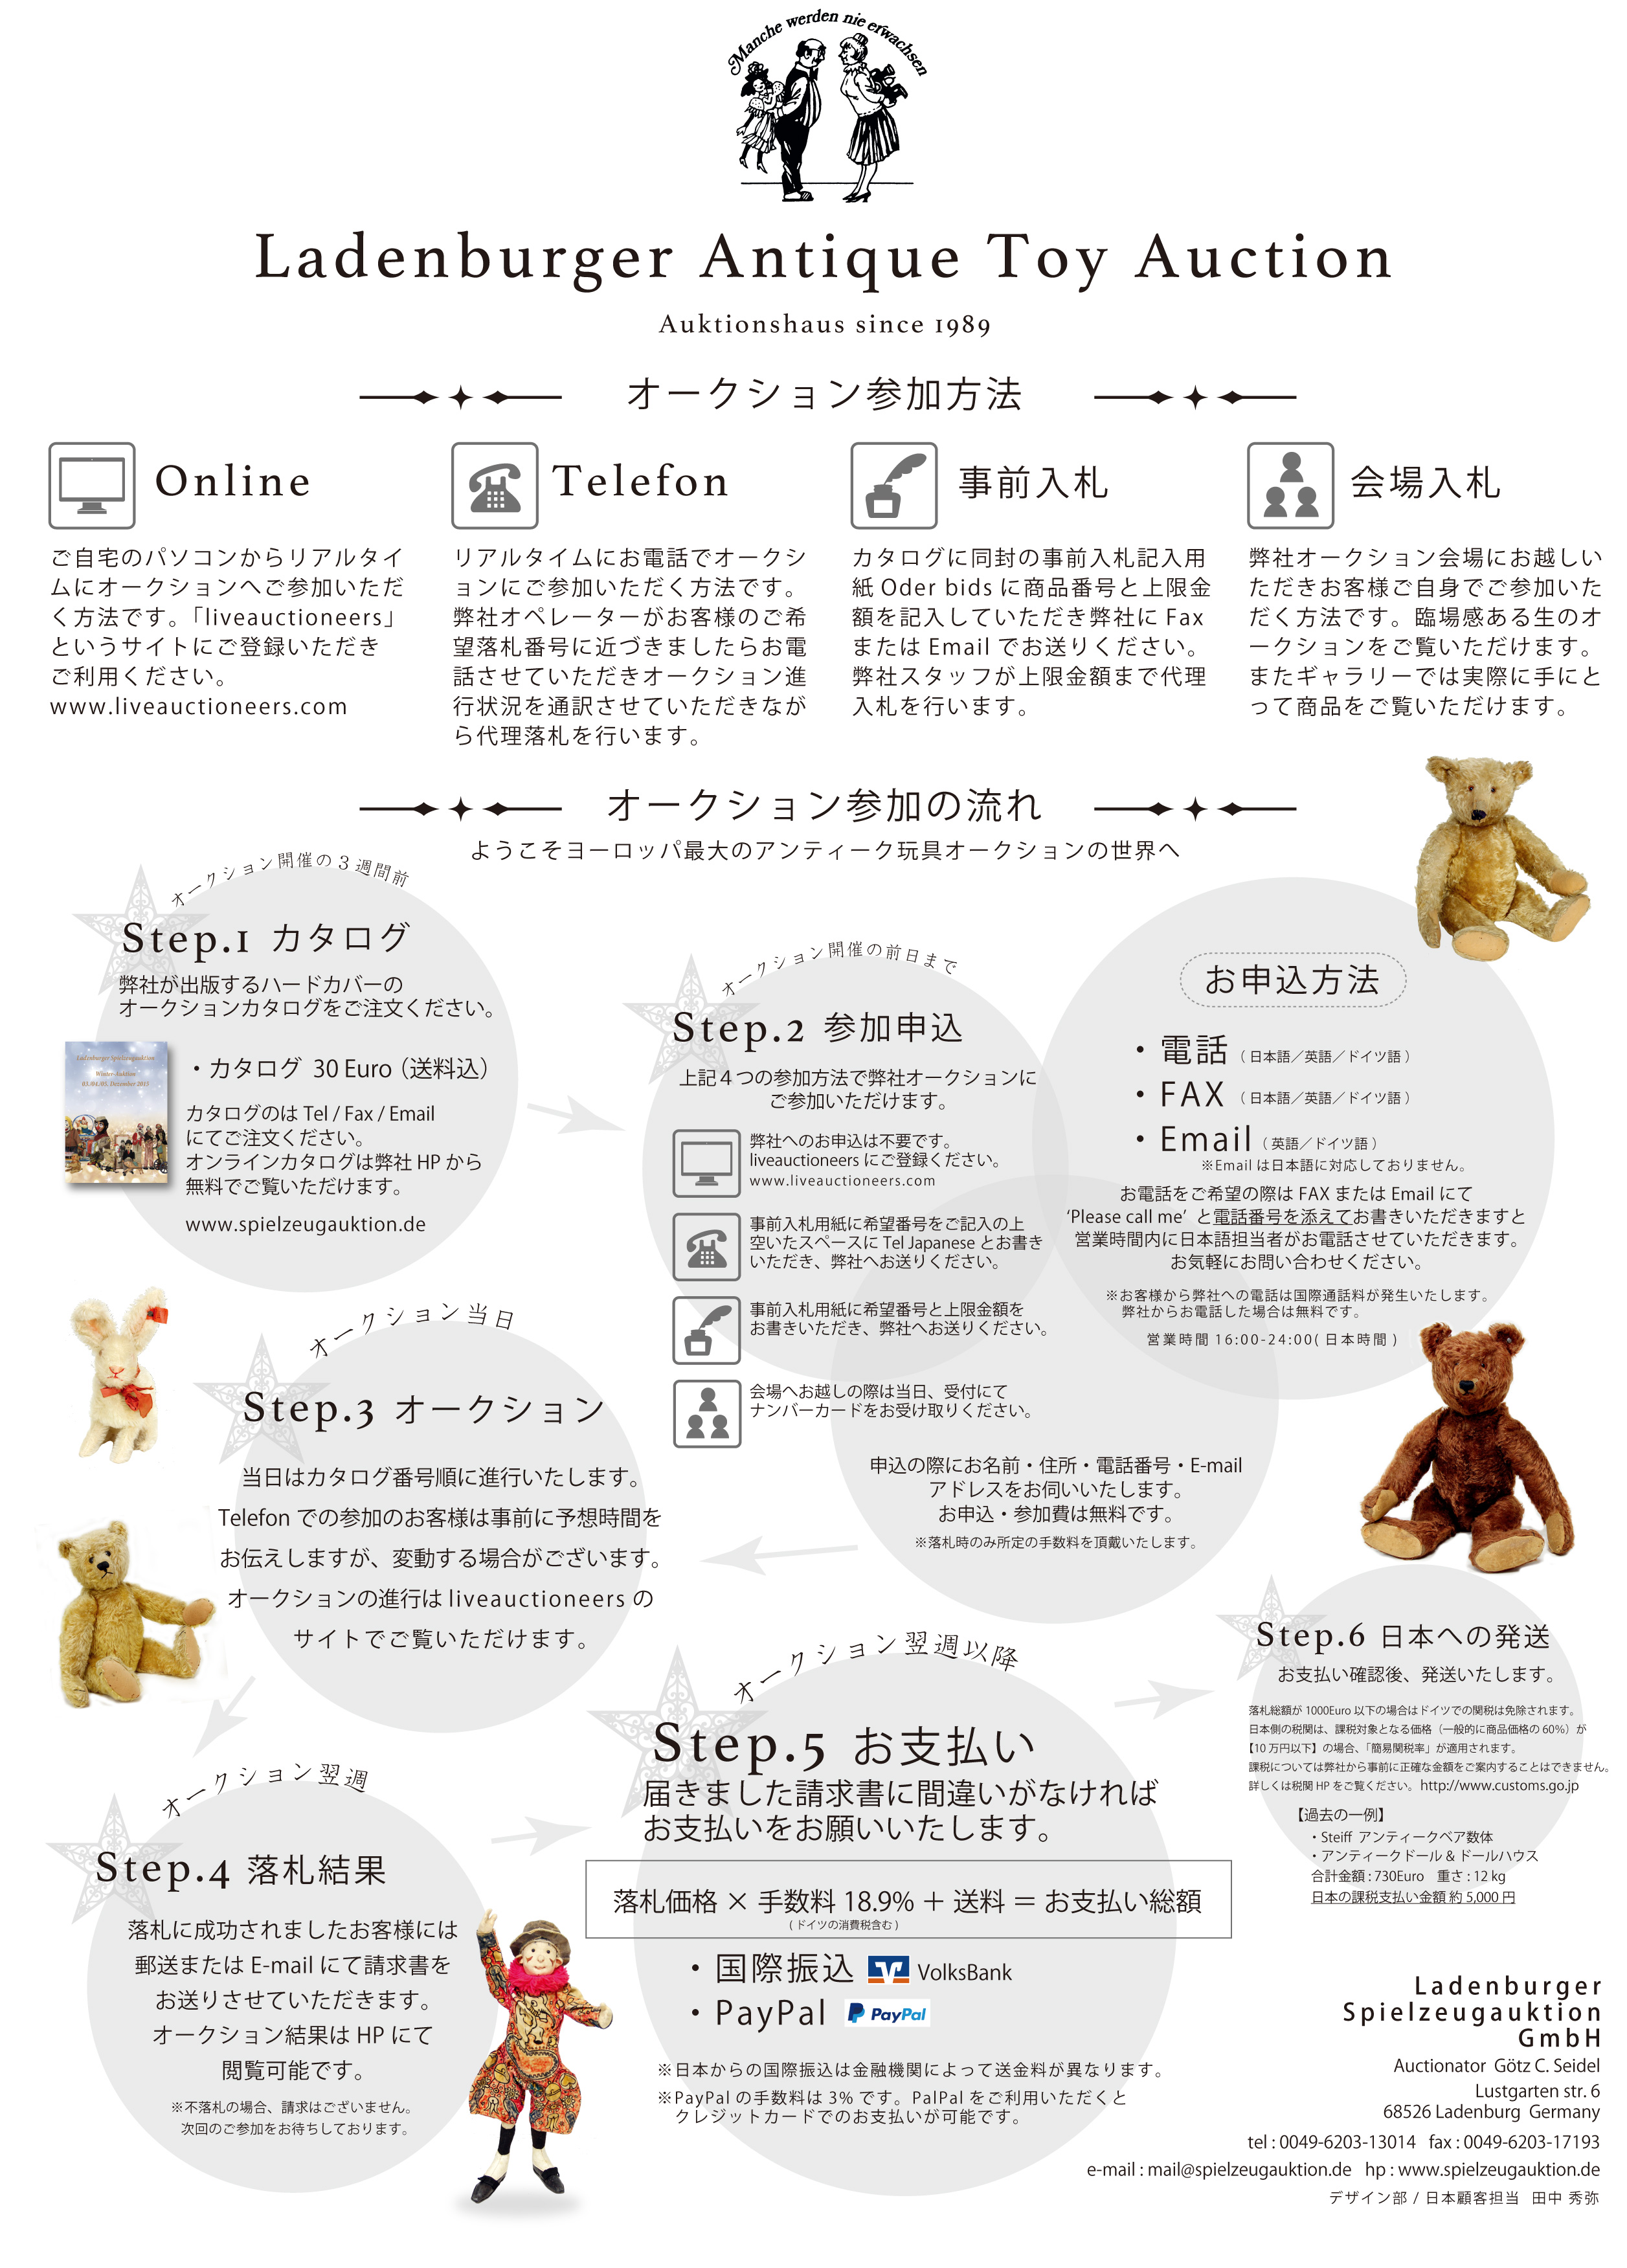 AuktionpapierJapan.jpg